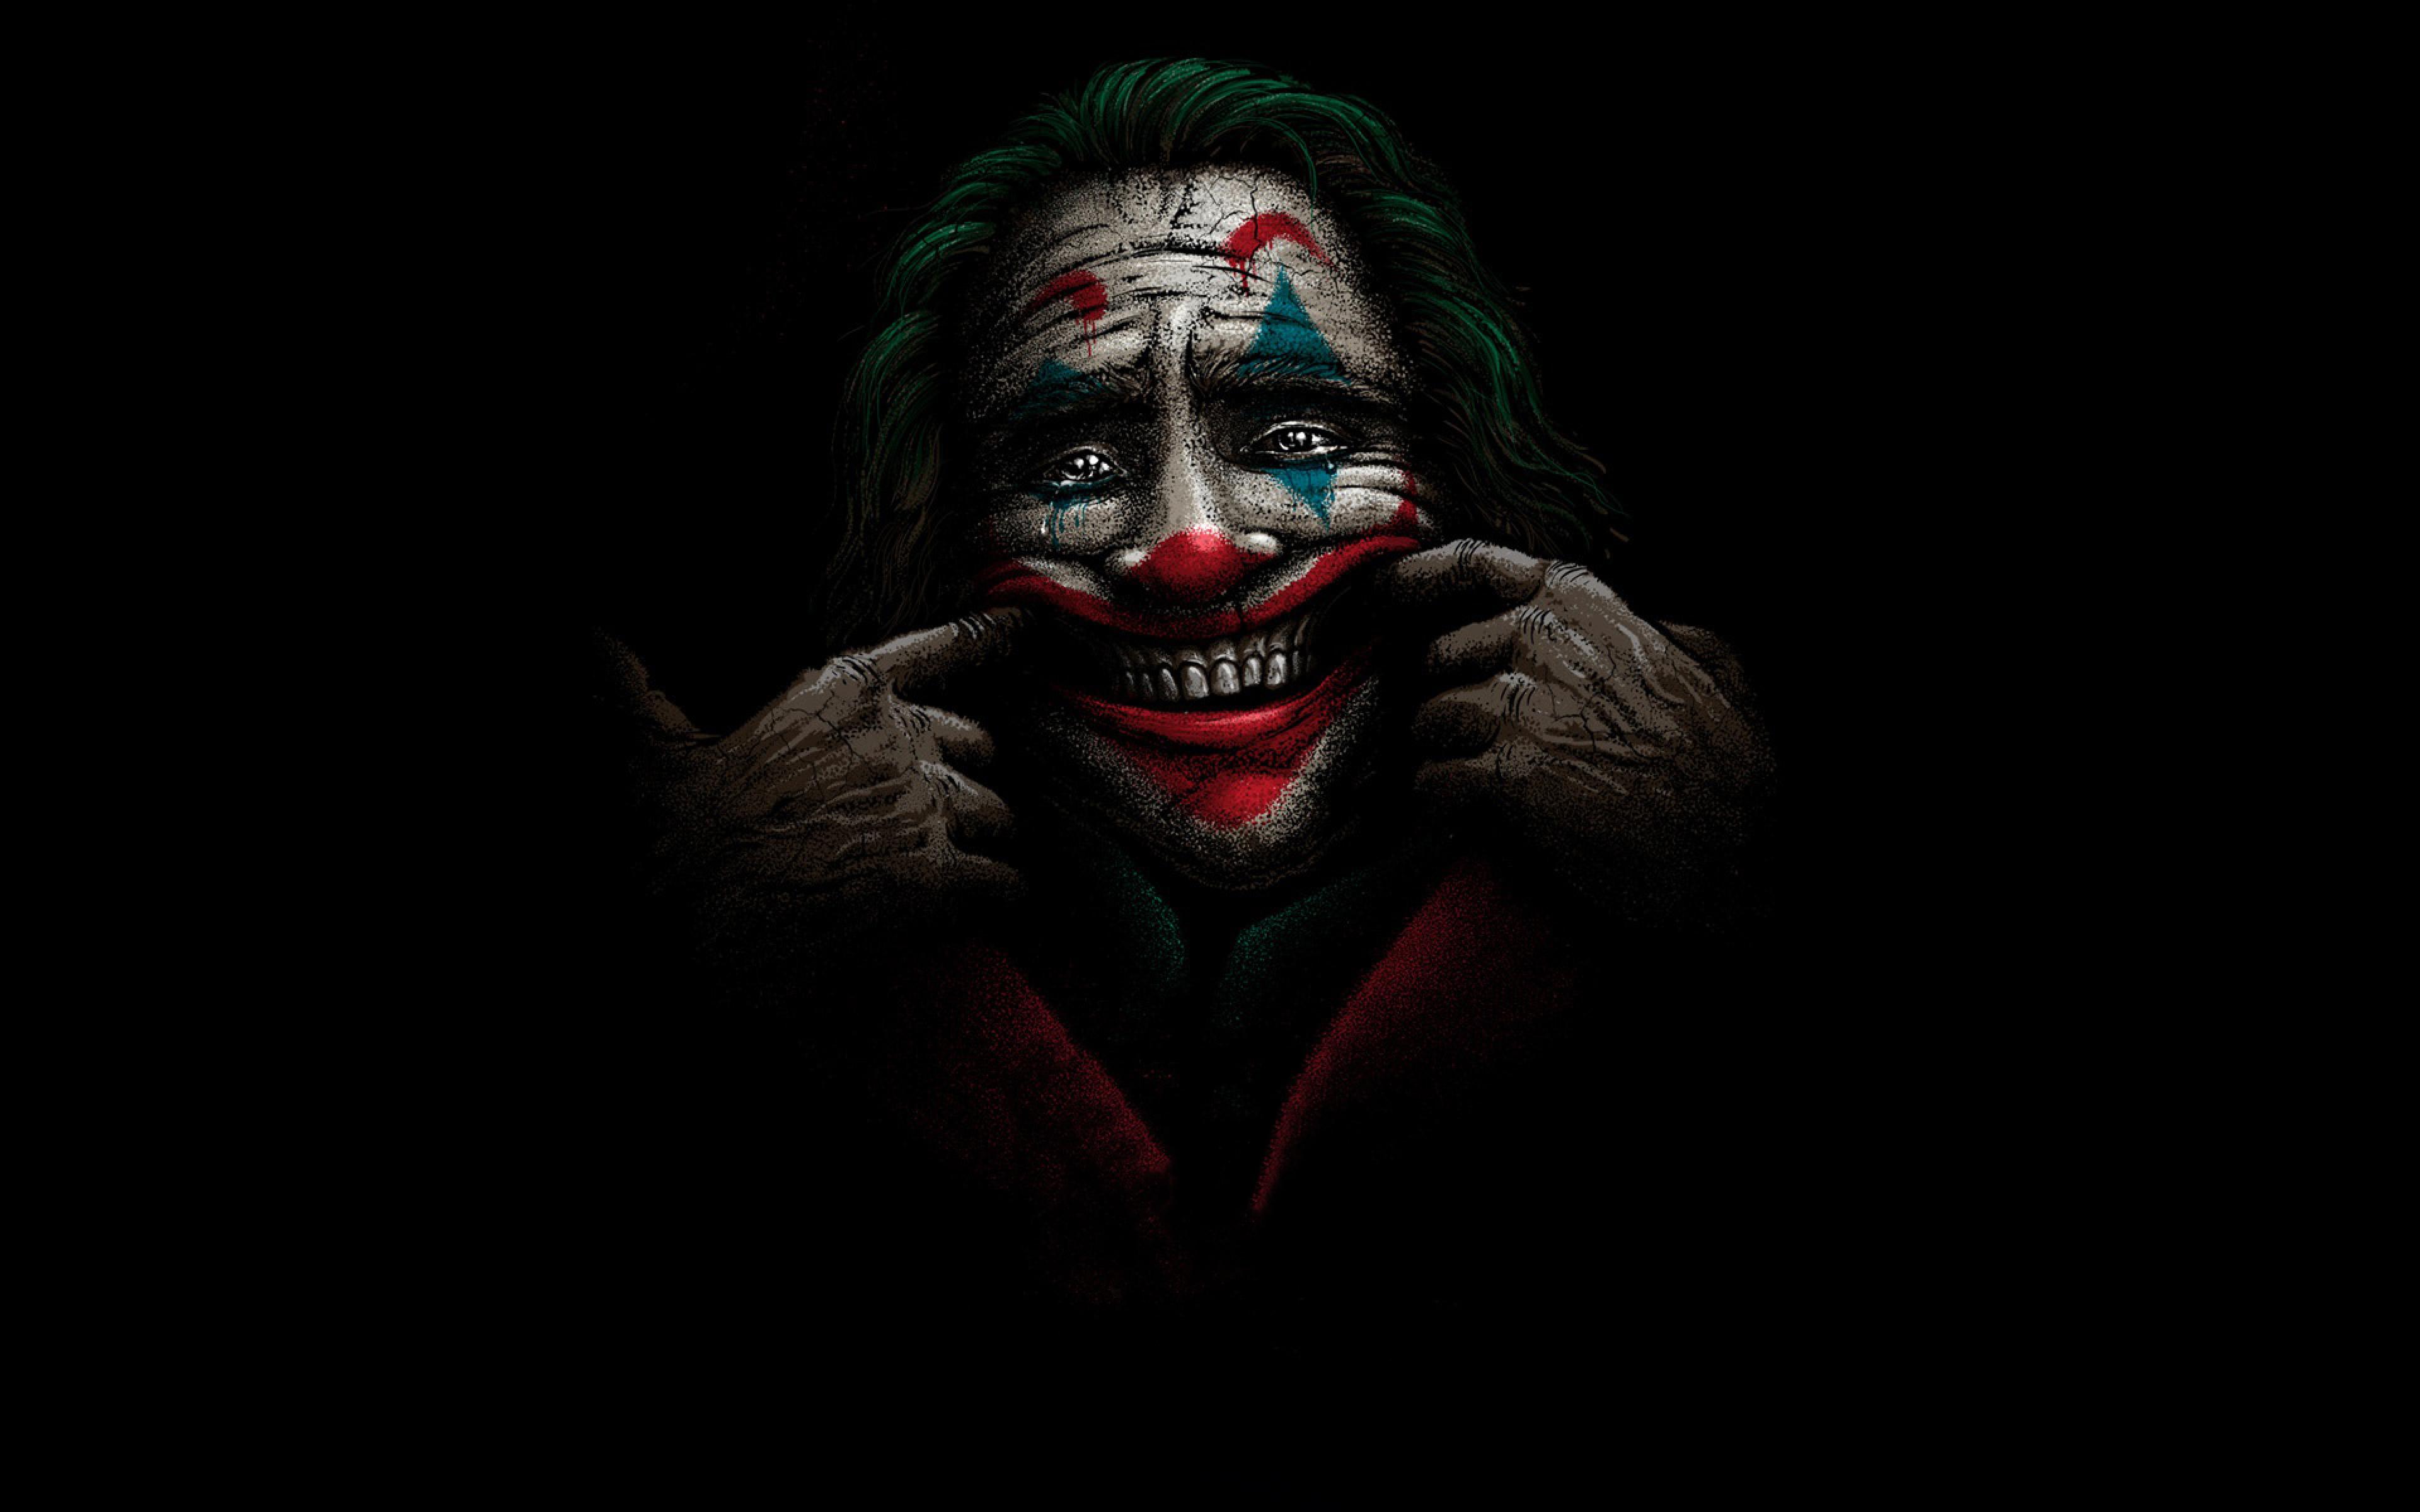 3840x2400 Joker Happy Face 4K 3840x2400 Resolution ...